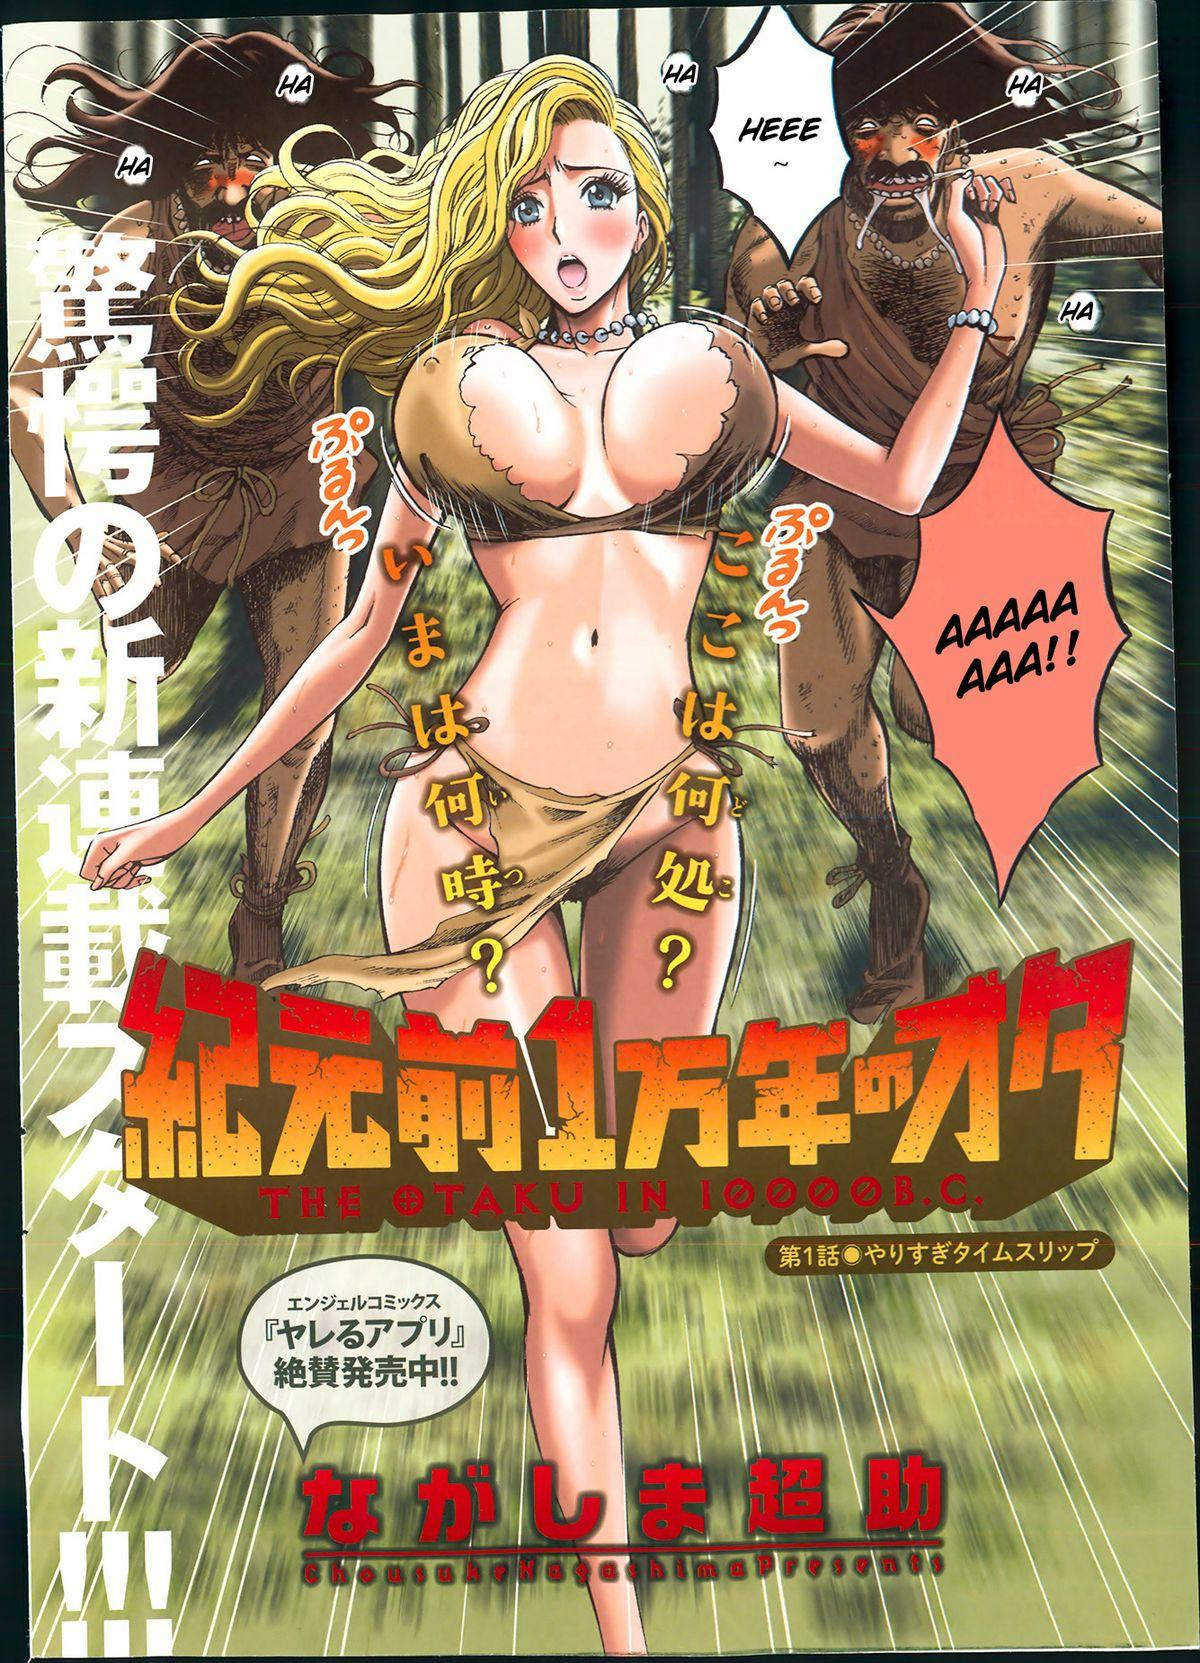 Kigenzen 10000 Nen no Ota   The Otaku in 10,000 B.C. Ch. 1-6 0